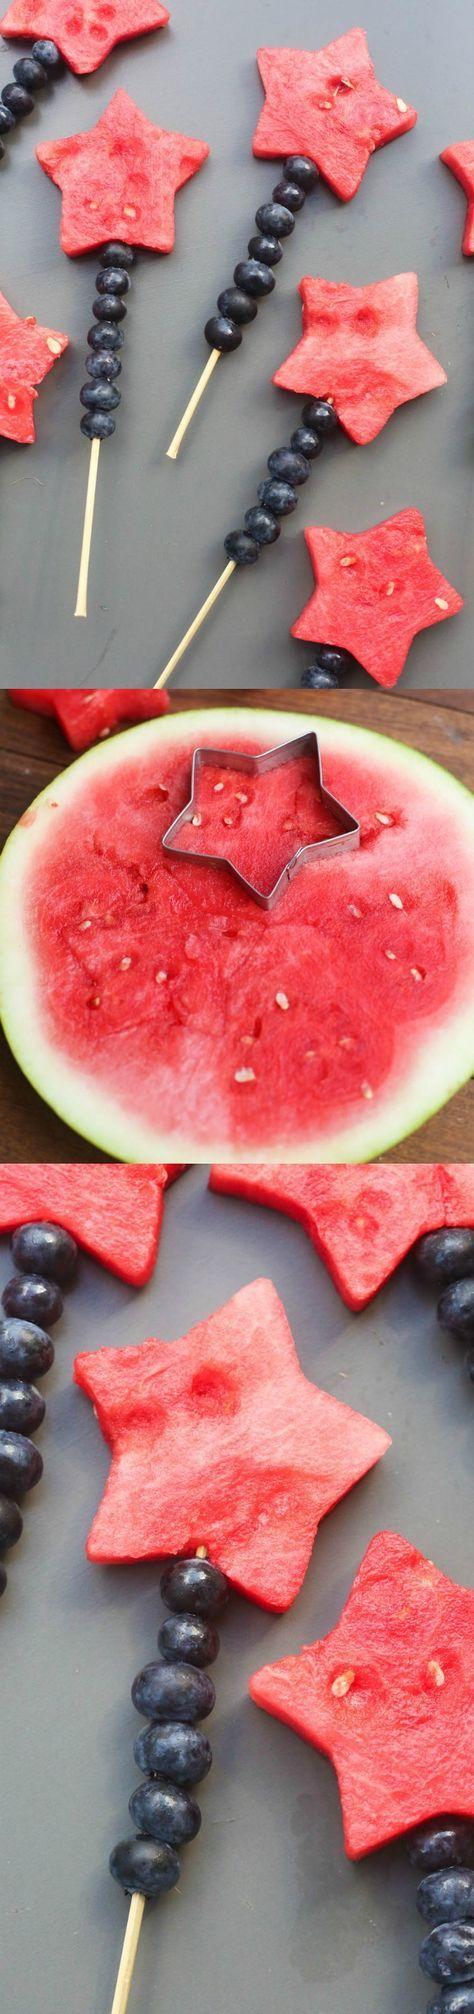 Fina fruktklubbor!